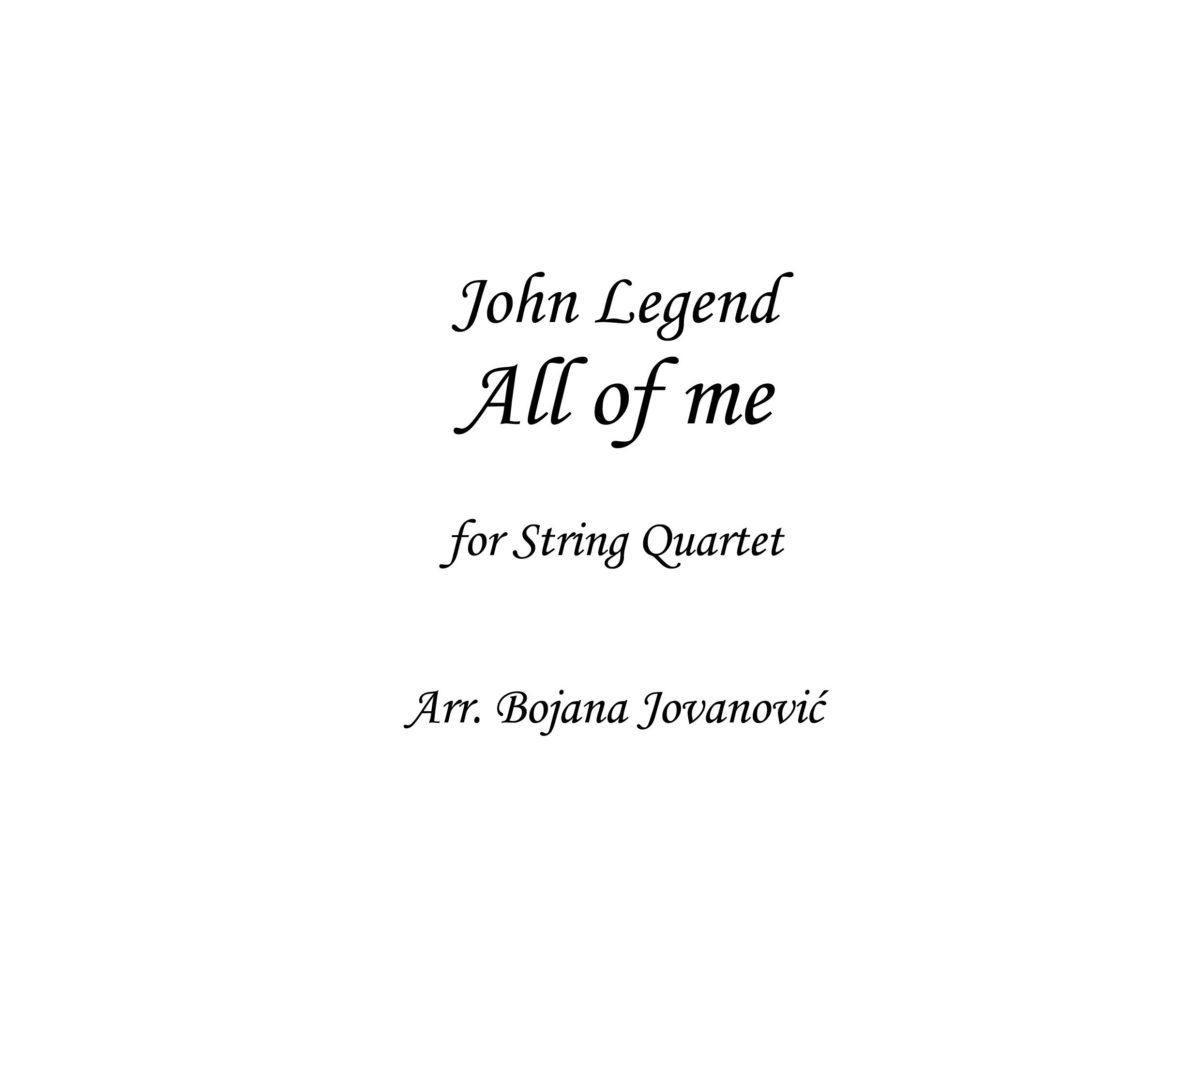 All of me (John Legend) - Sheet Music